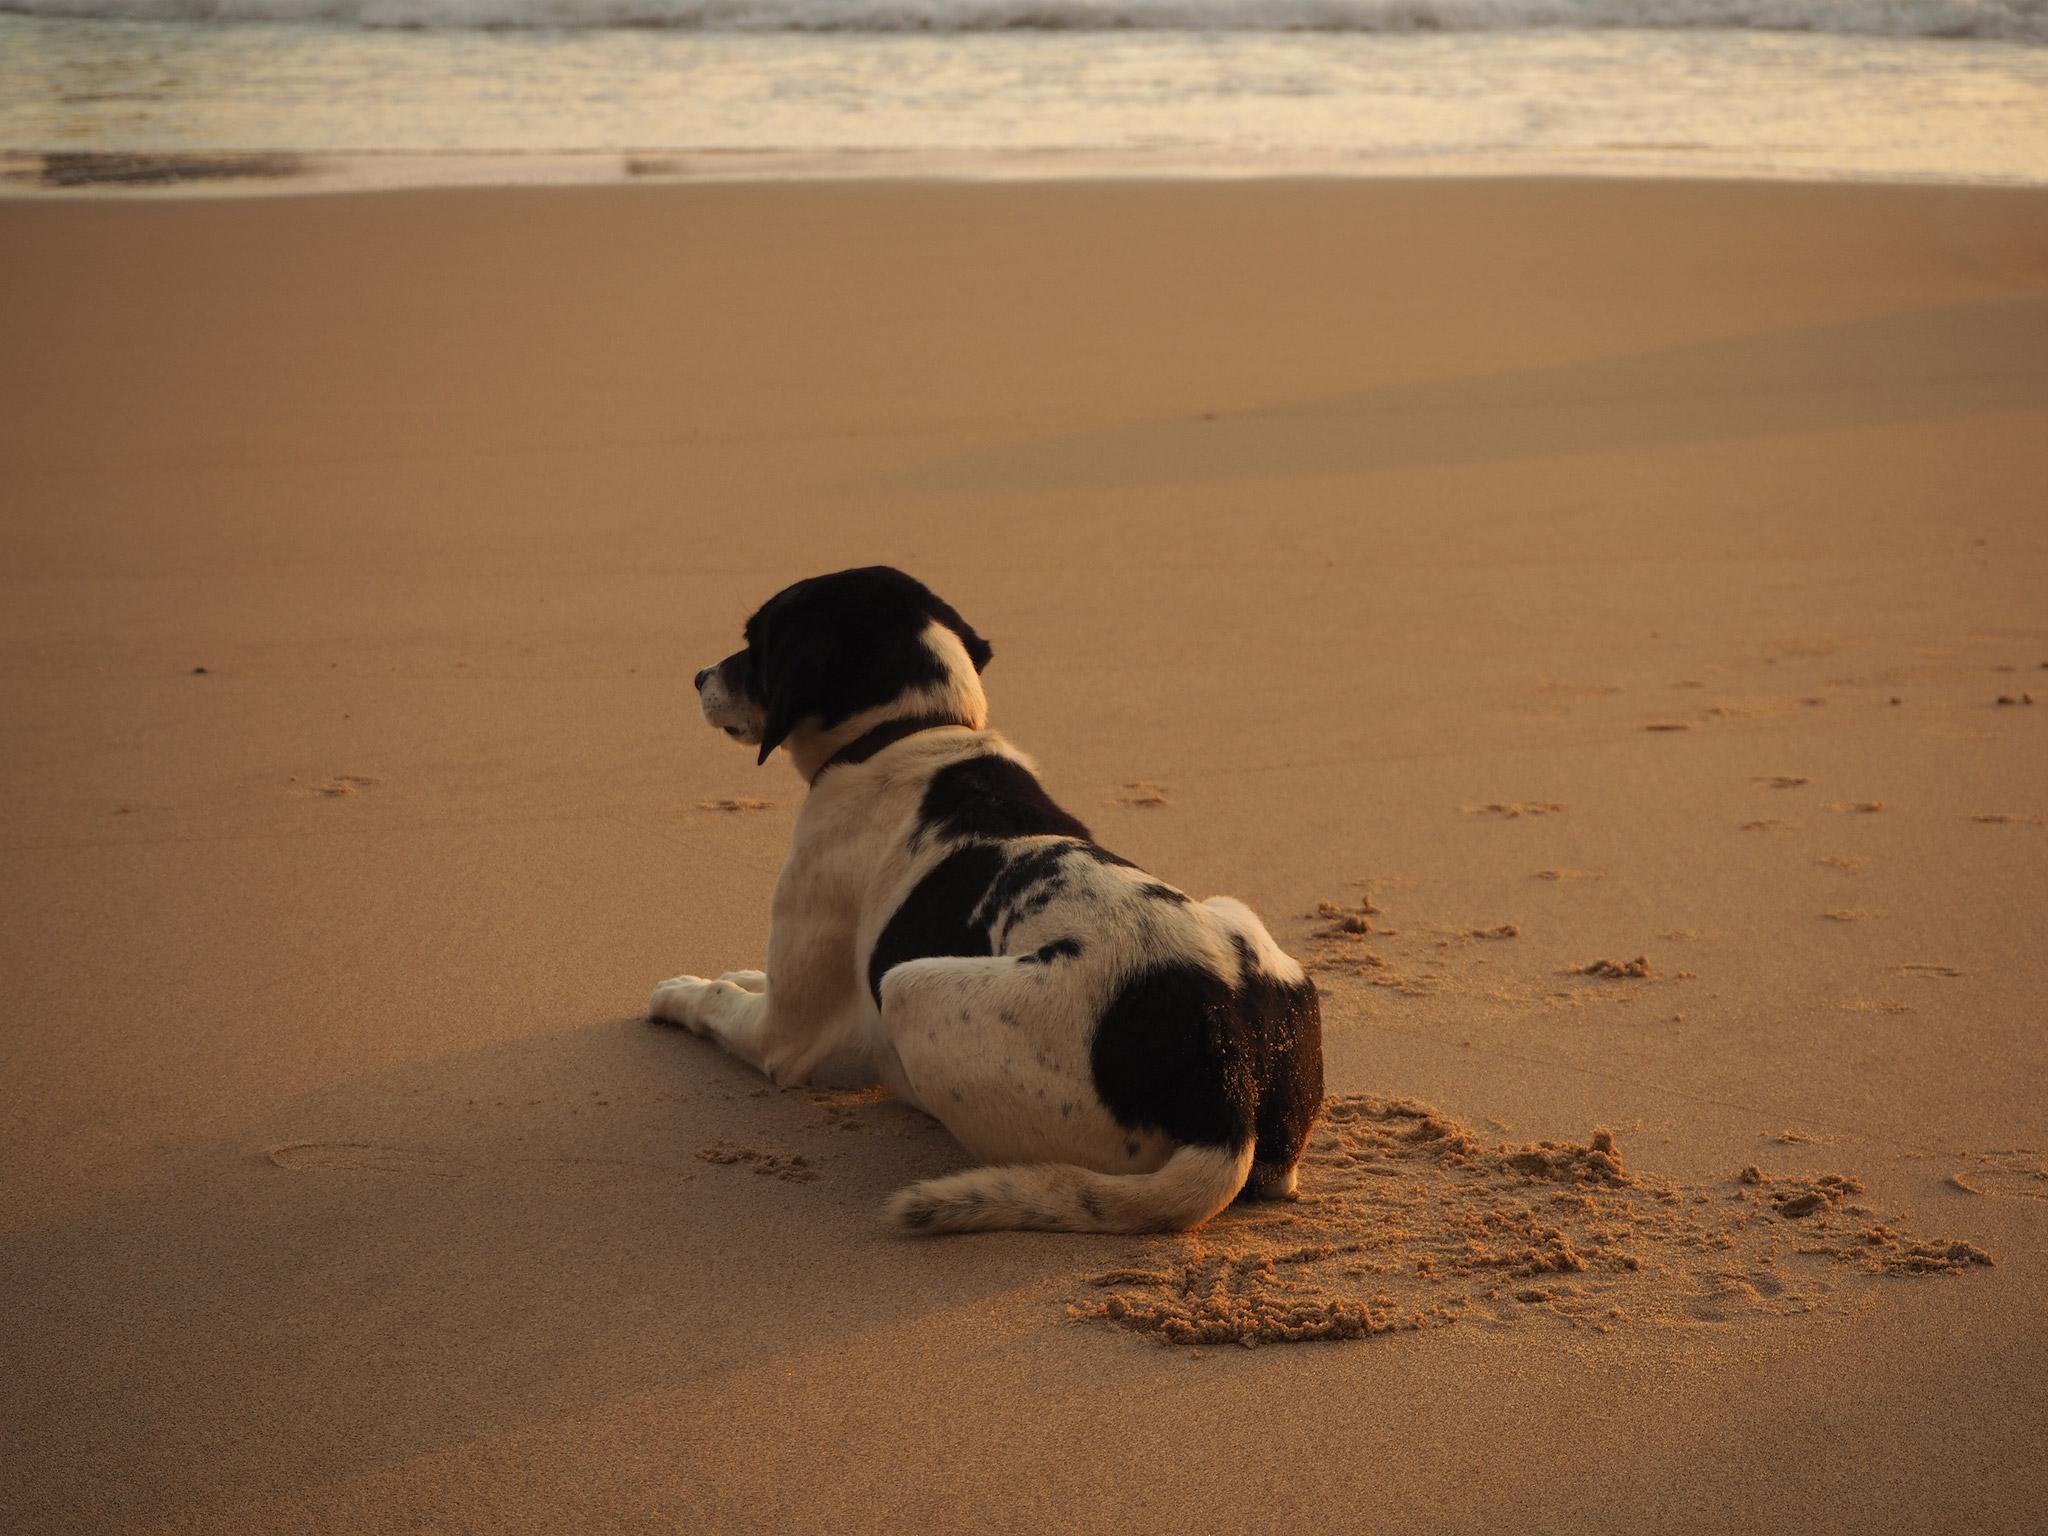 Dog. Photo by Hanne Kristin Berg